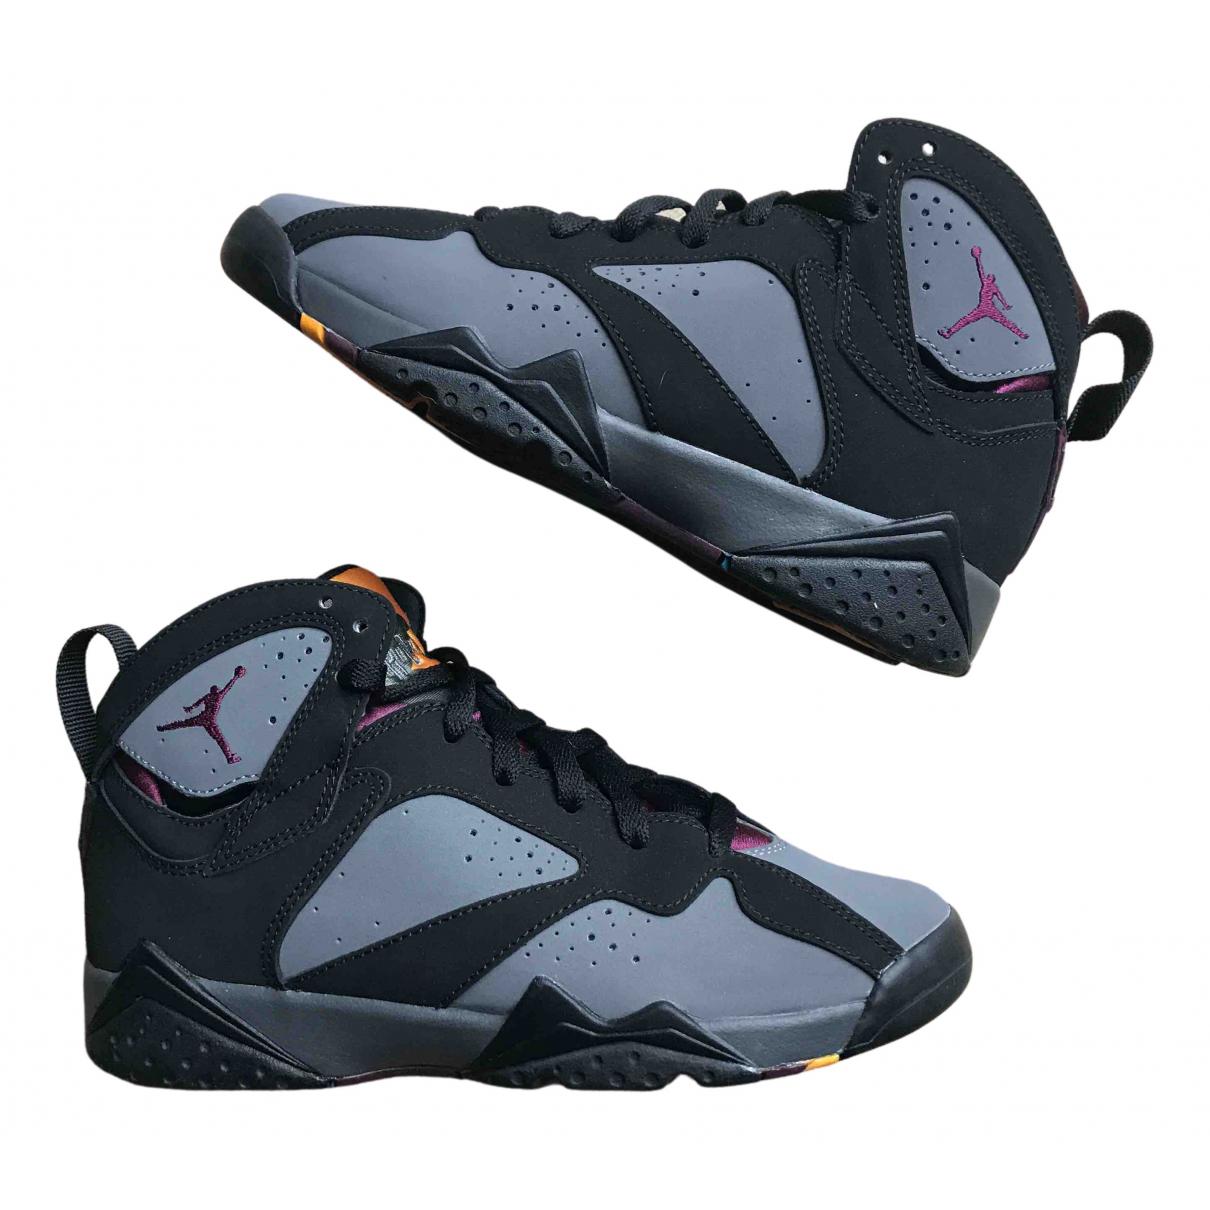 Jordan Air Jordan 7 Sneakers in  Schwarz Veloursleder